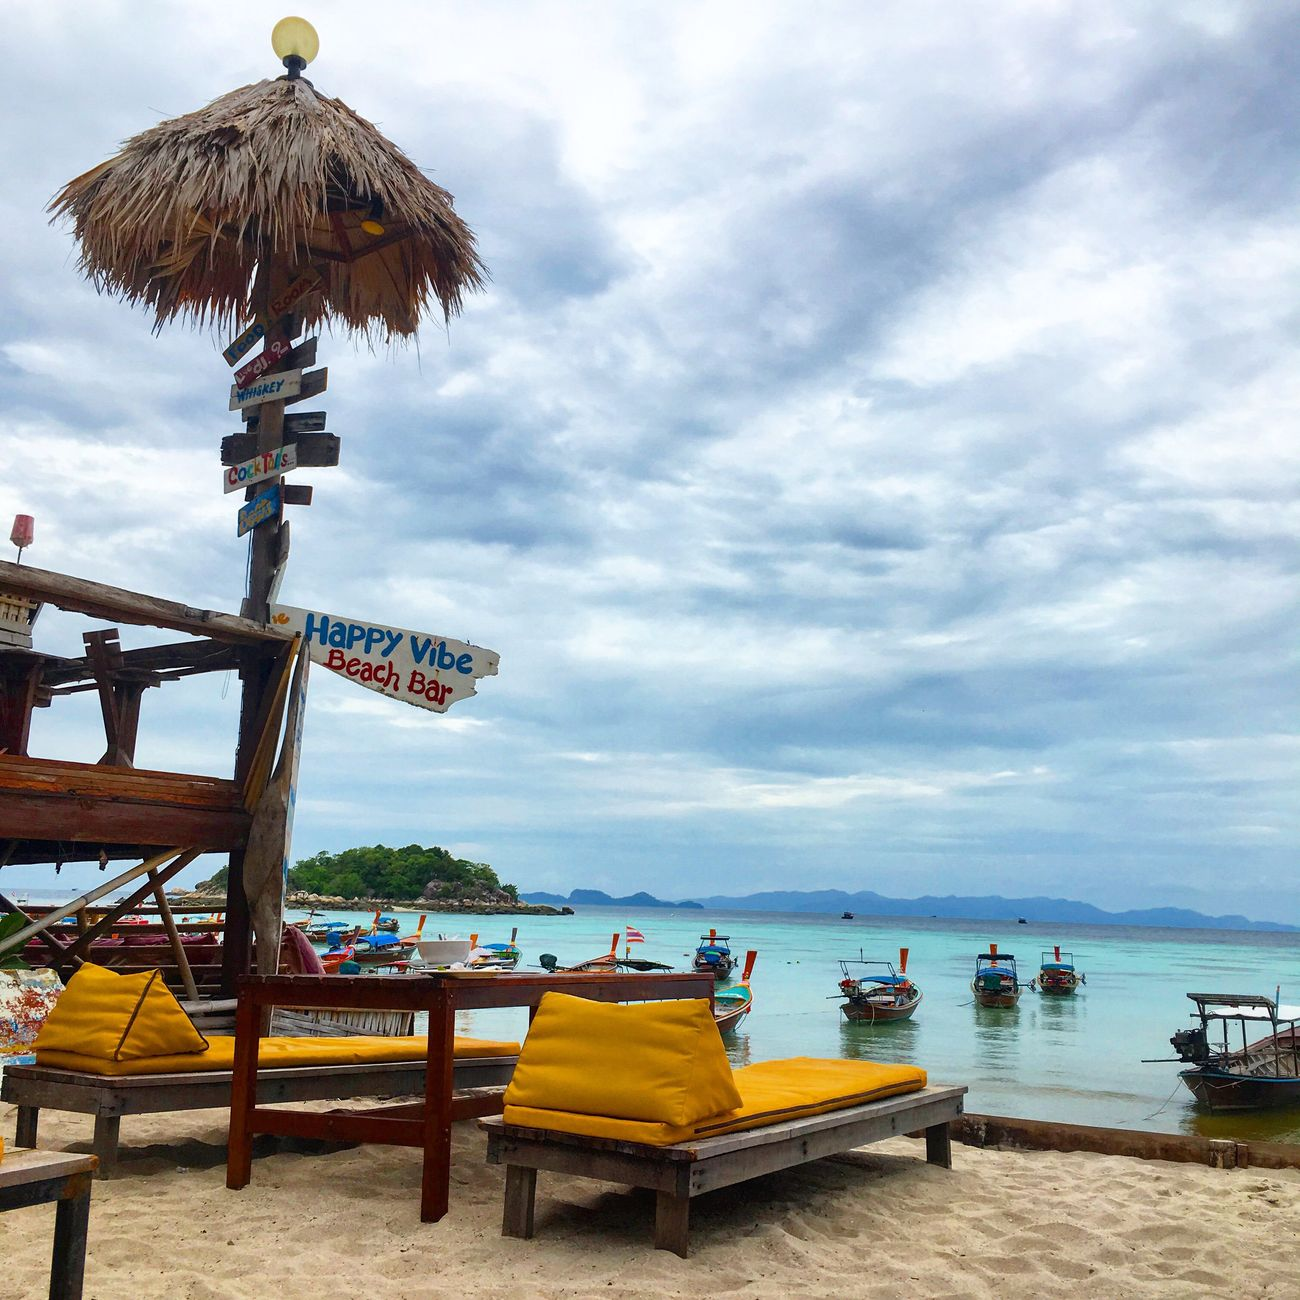 Relaxing Taking Photos Chillaxing Traveling Lipe Island Thailand Enjoying Life